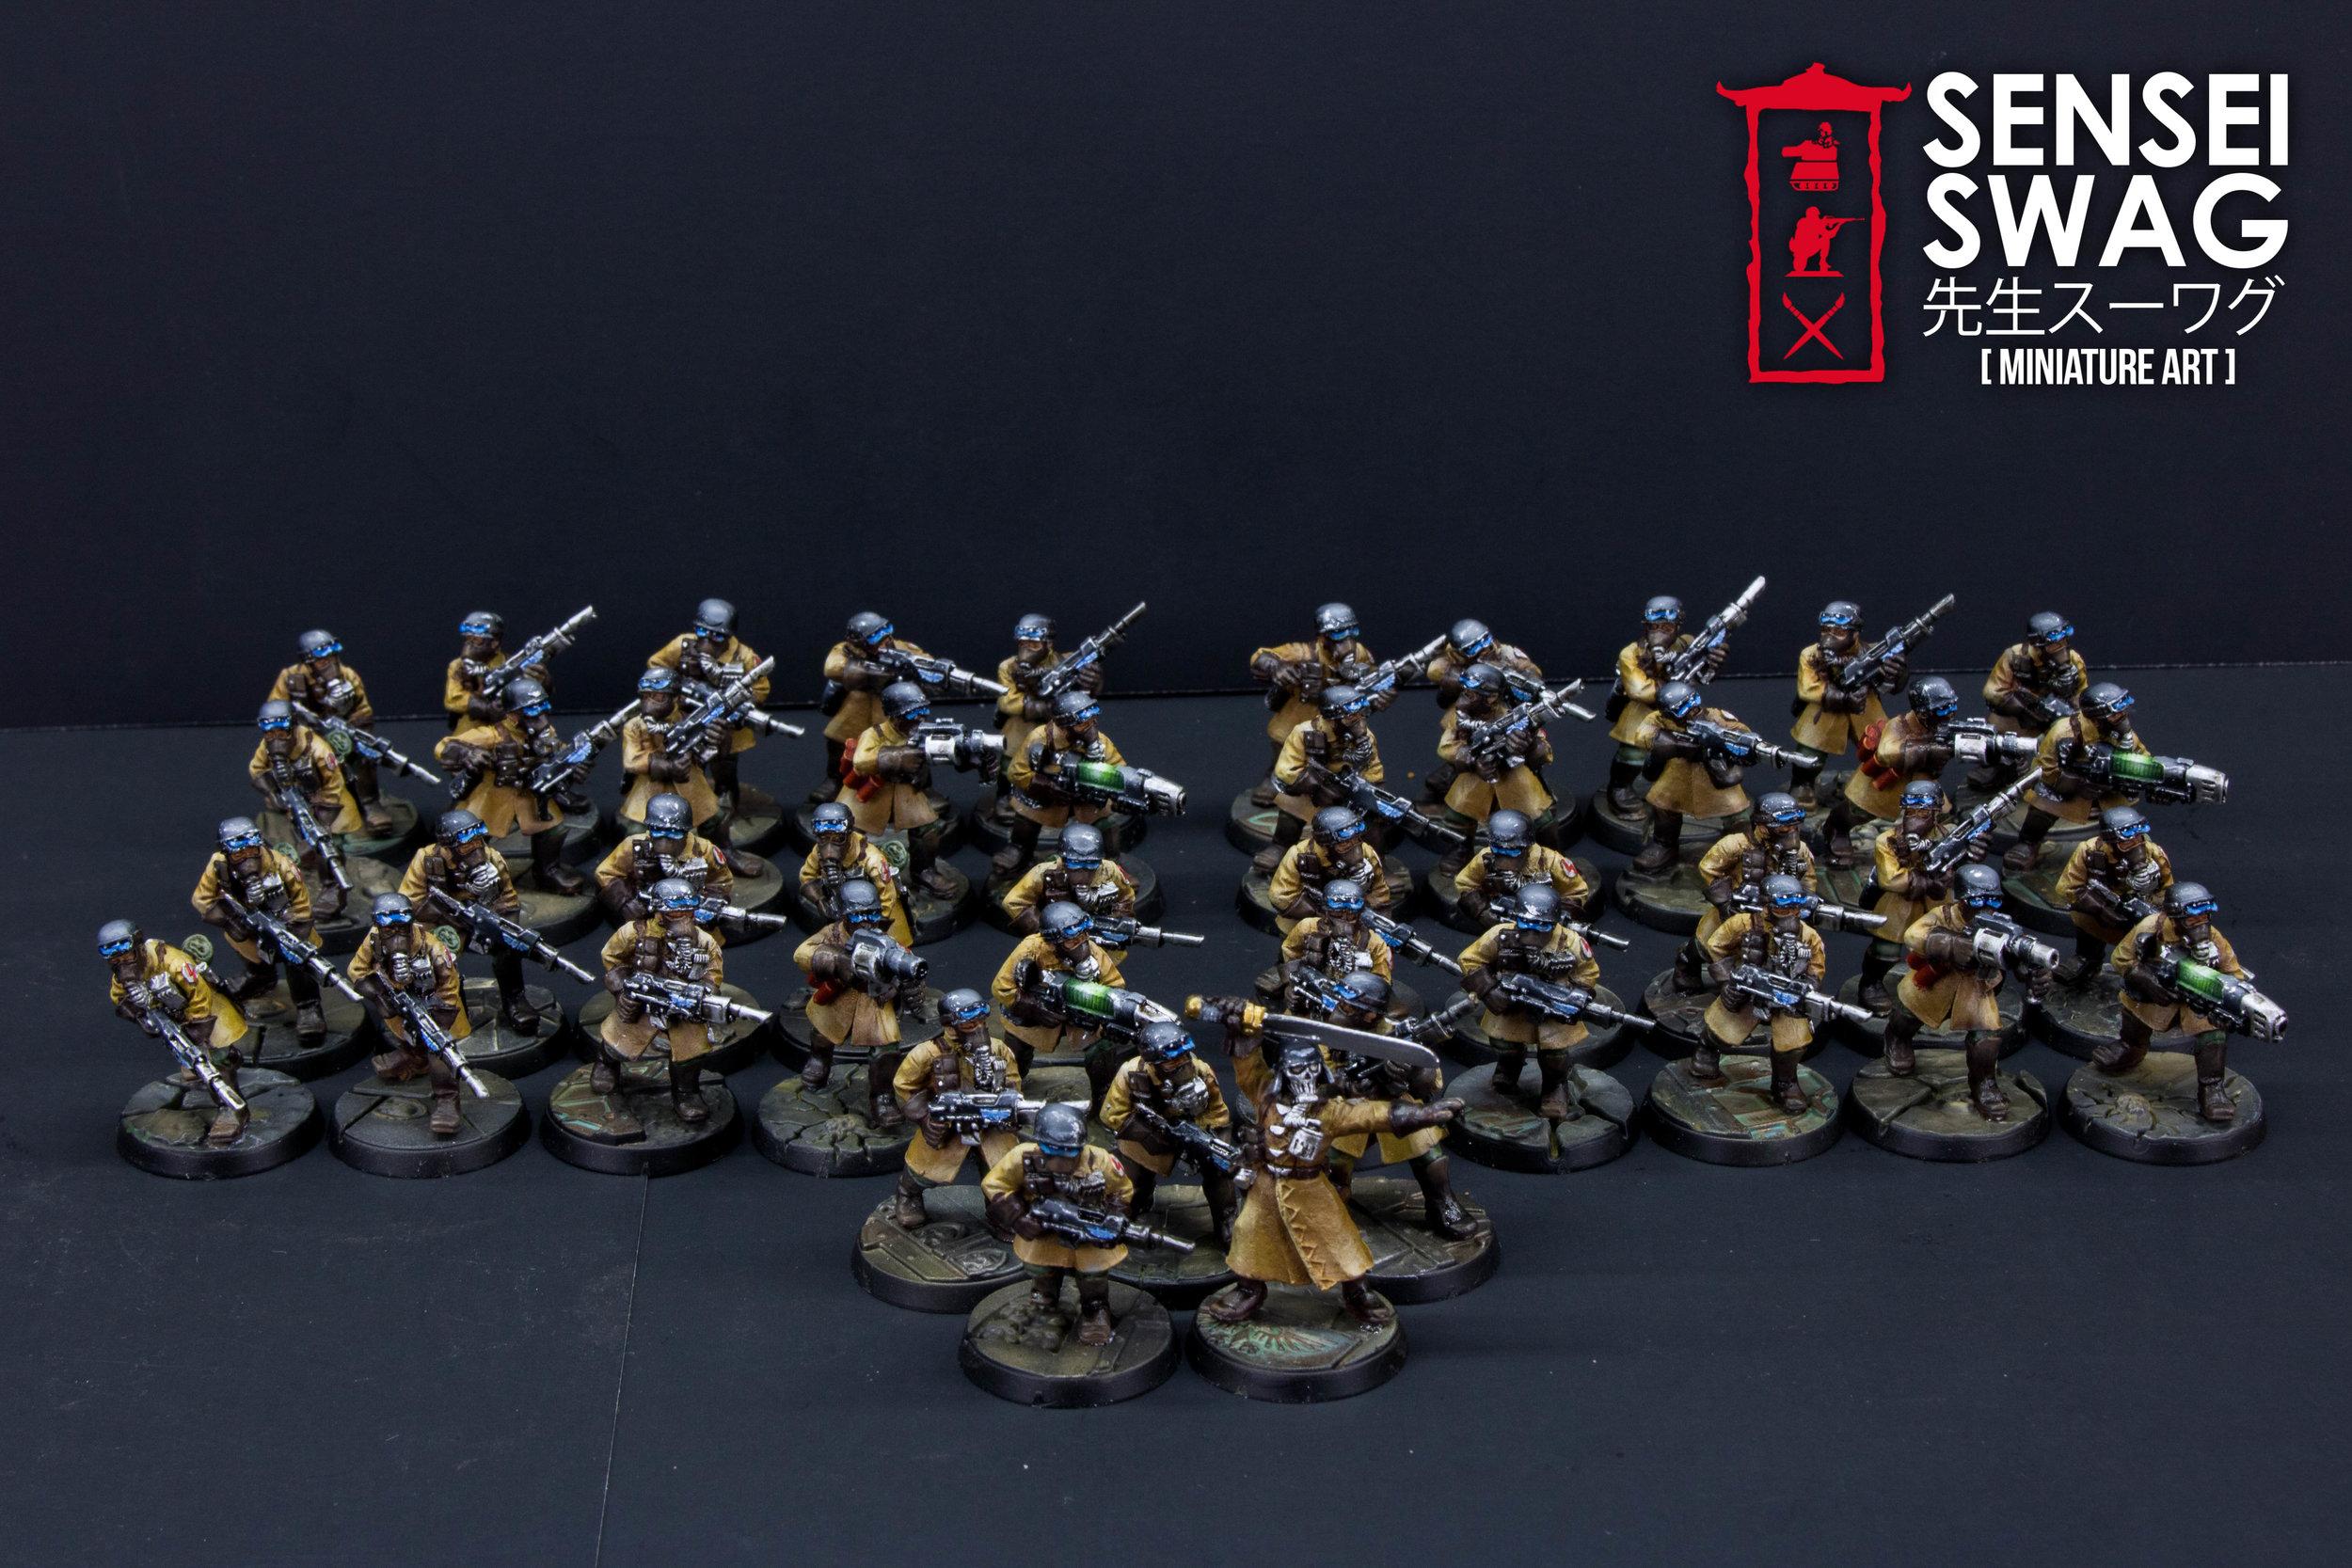 Armegeddon Steel Lgion Aatra Militarum Imperial Guard 40k (3 of 5).jpg